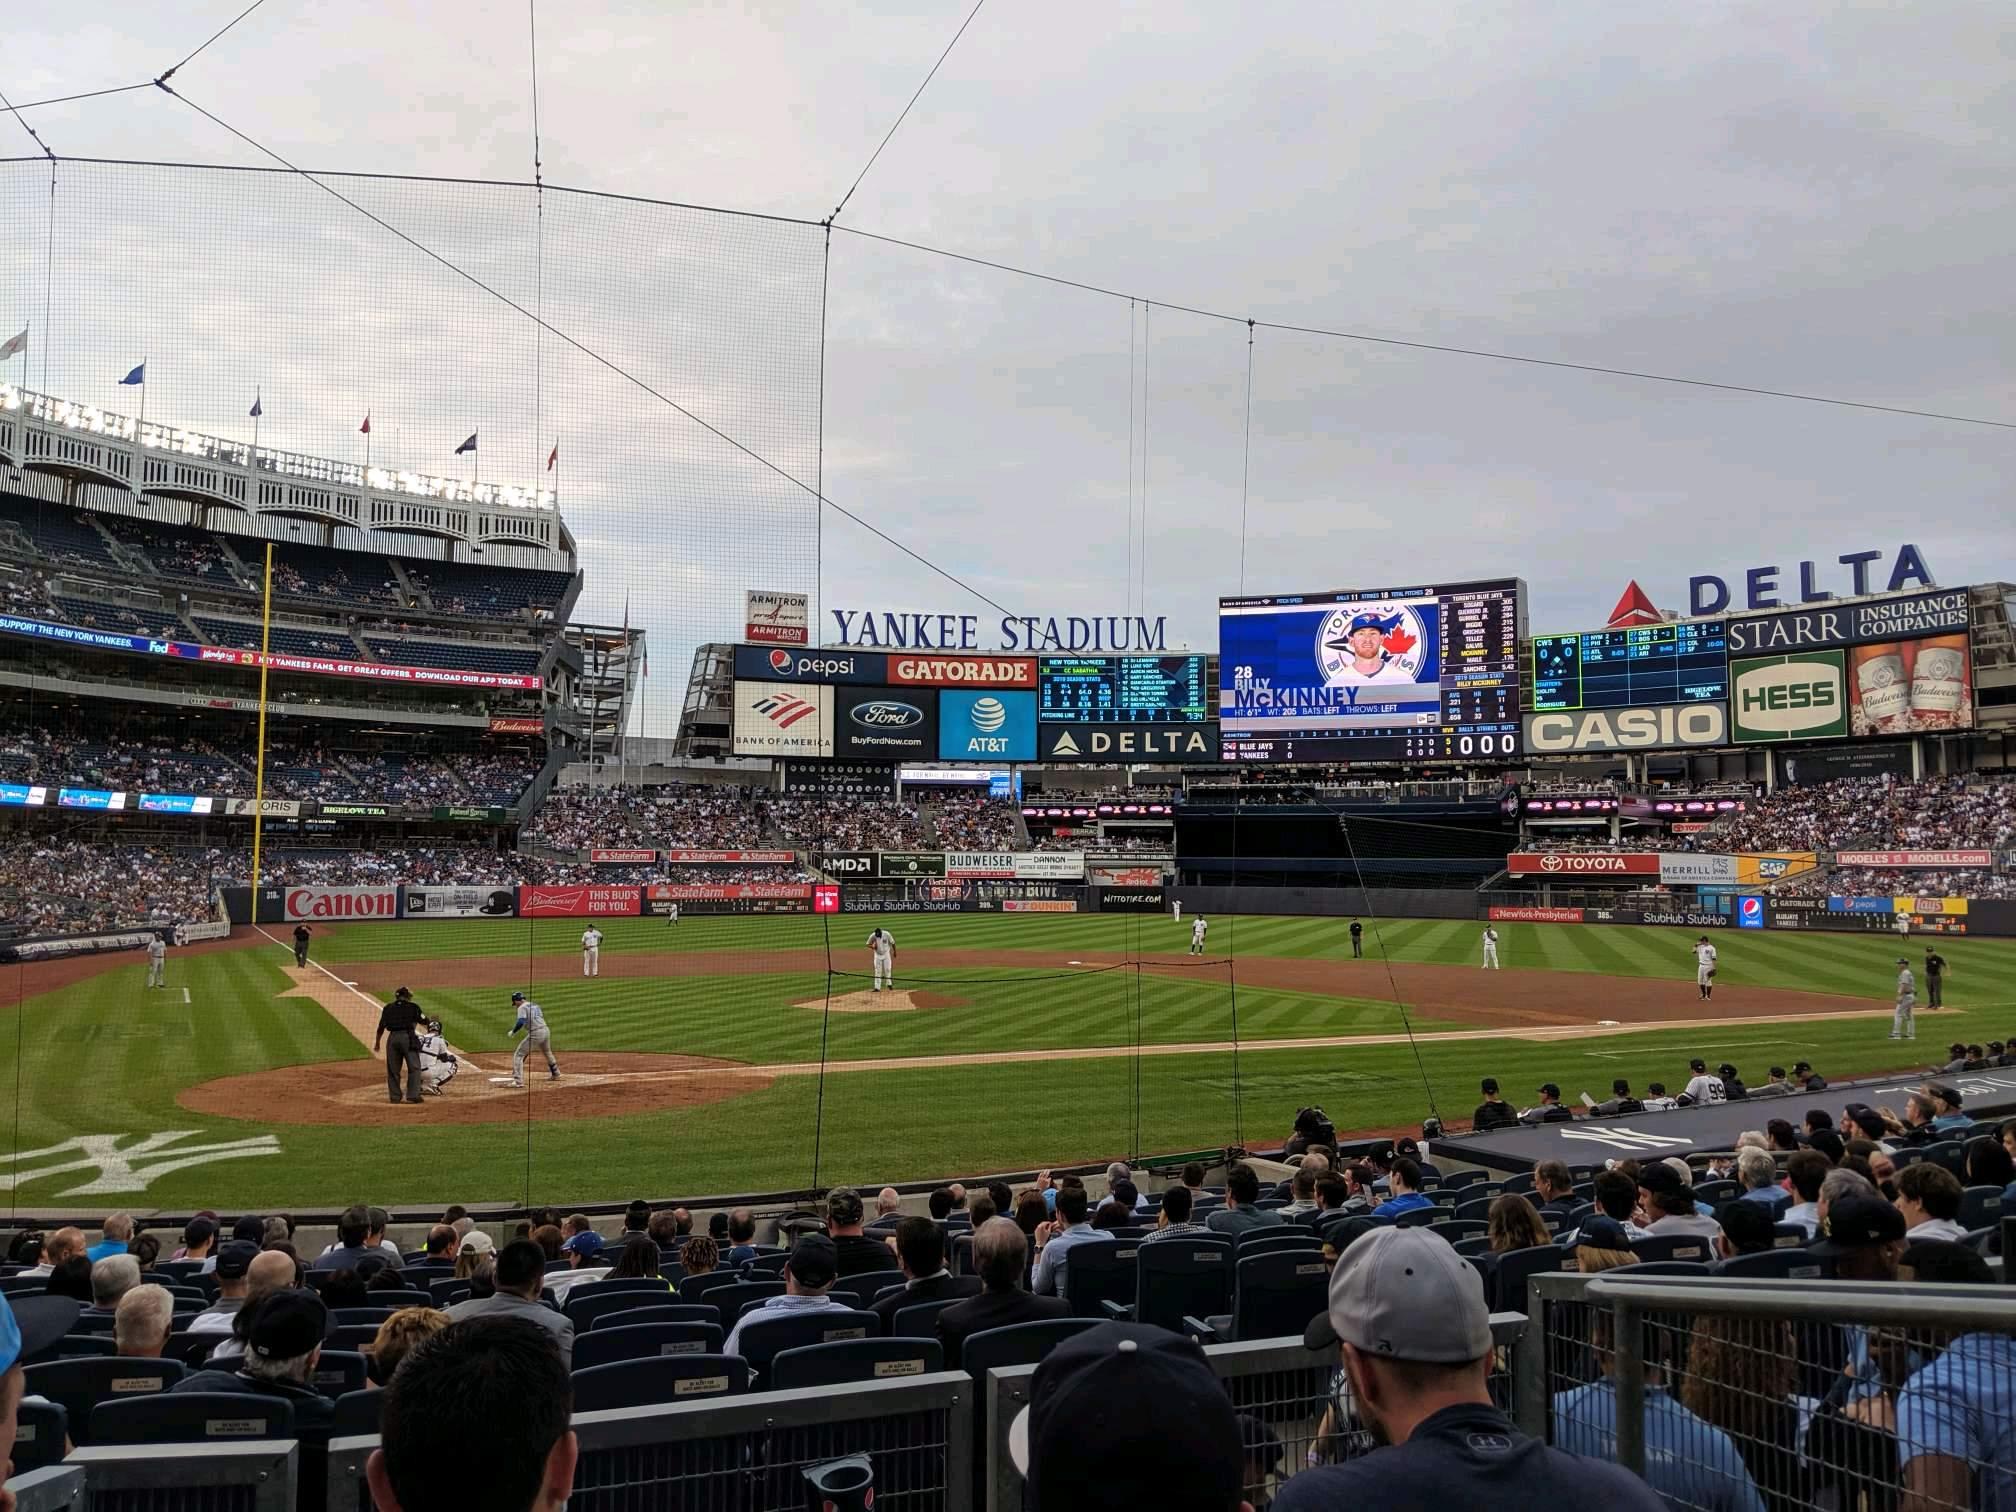 Yankee Stadium Secção 118 Fila 4 Lugar 3